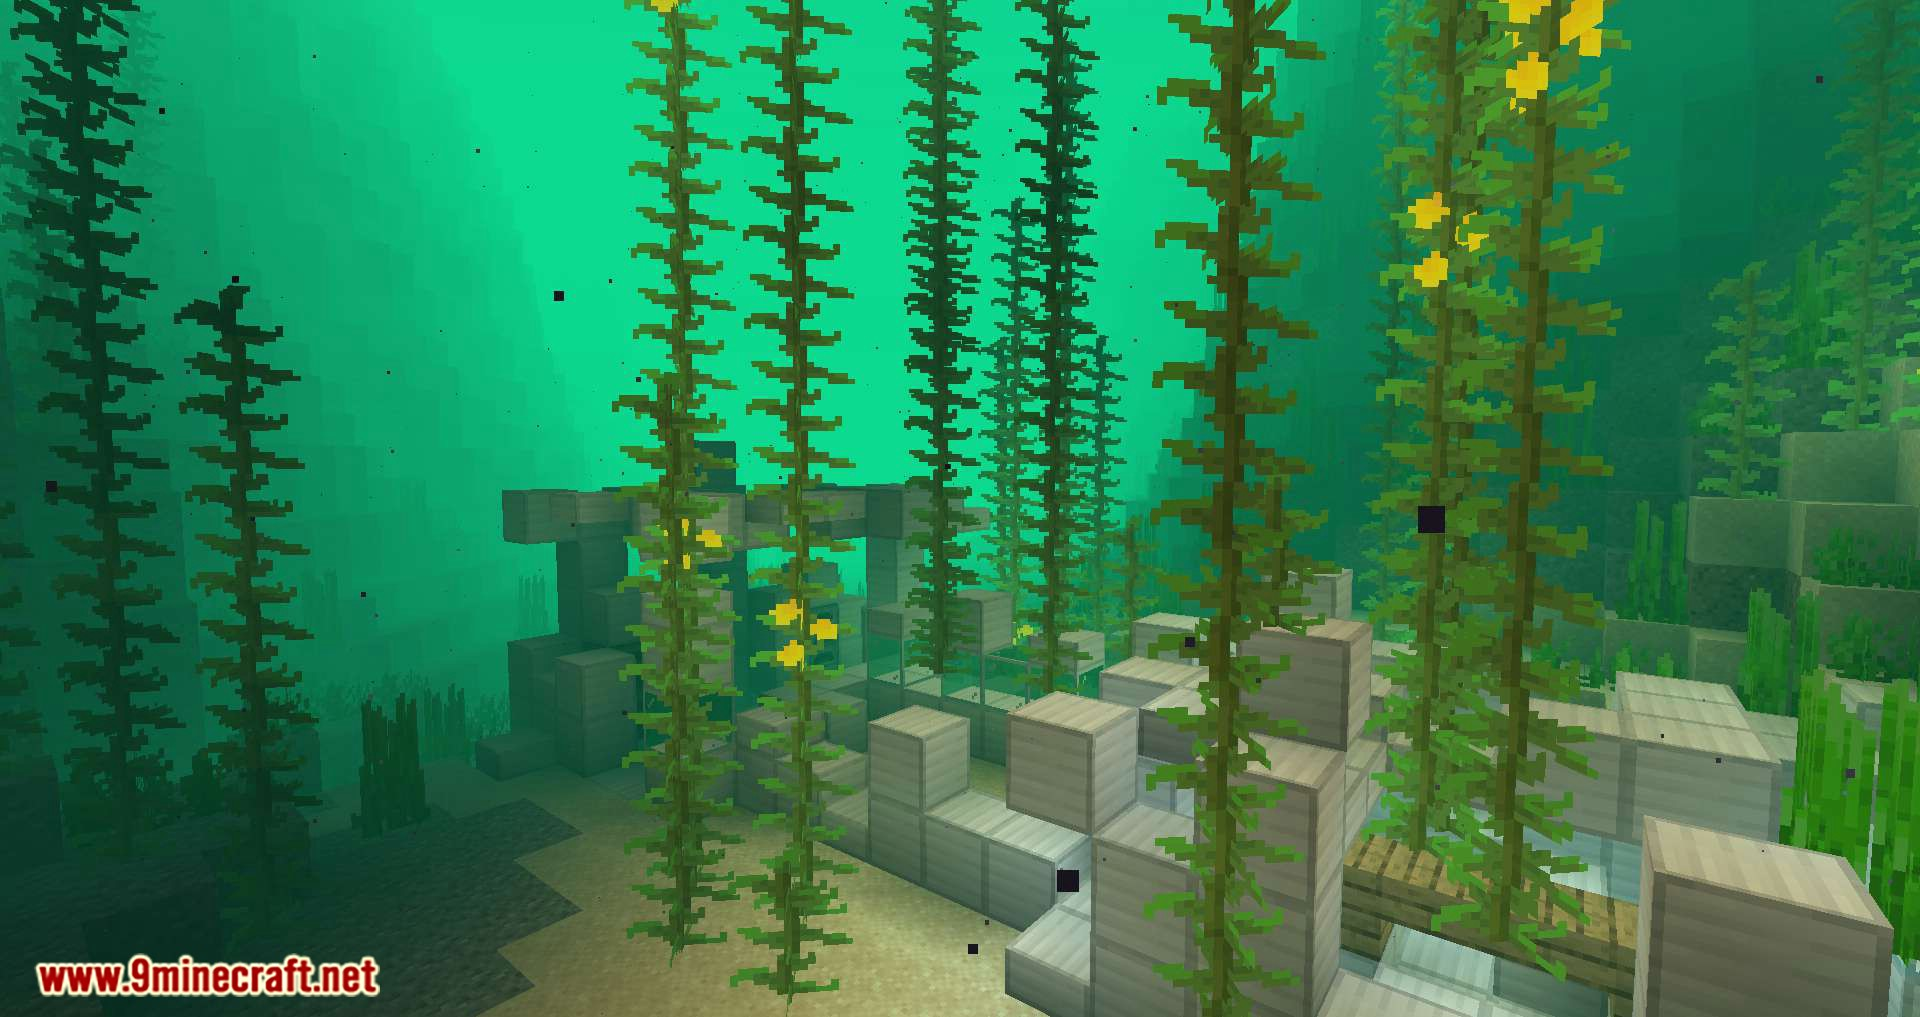 underwater biome mod minecraft ocean biomes 9minecraft tech features tree requires